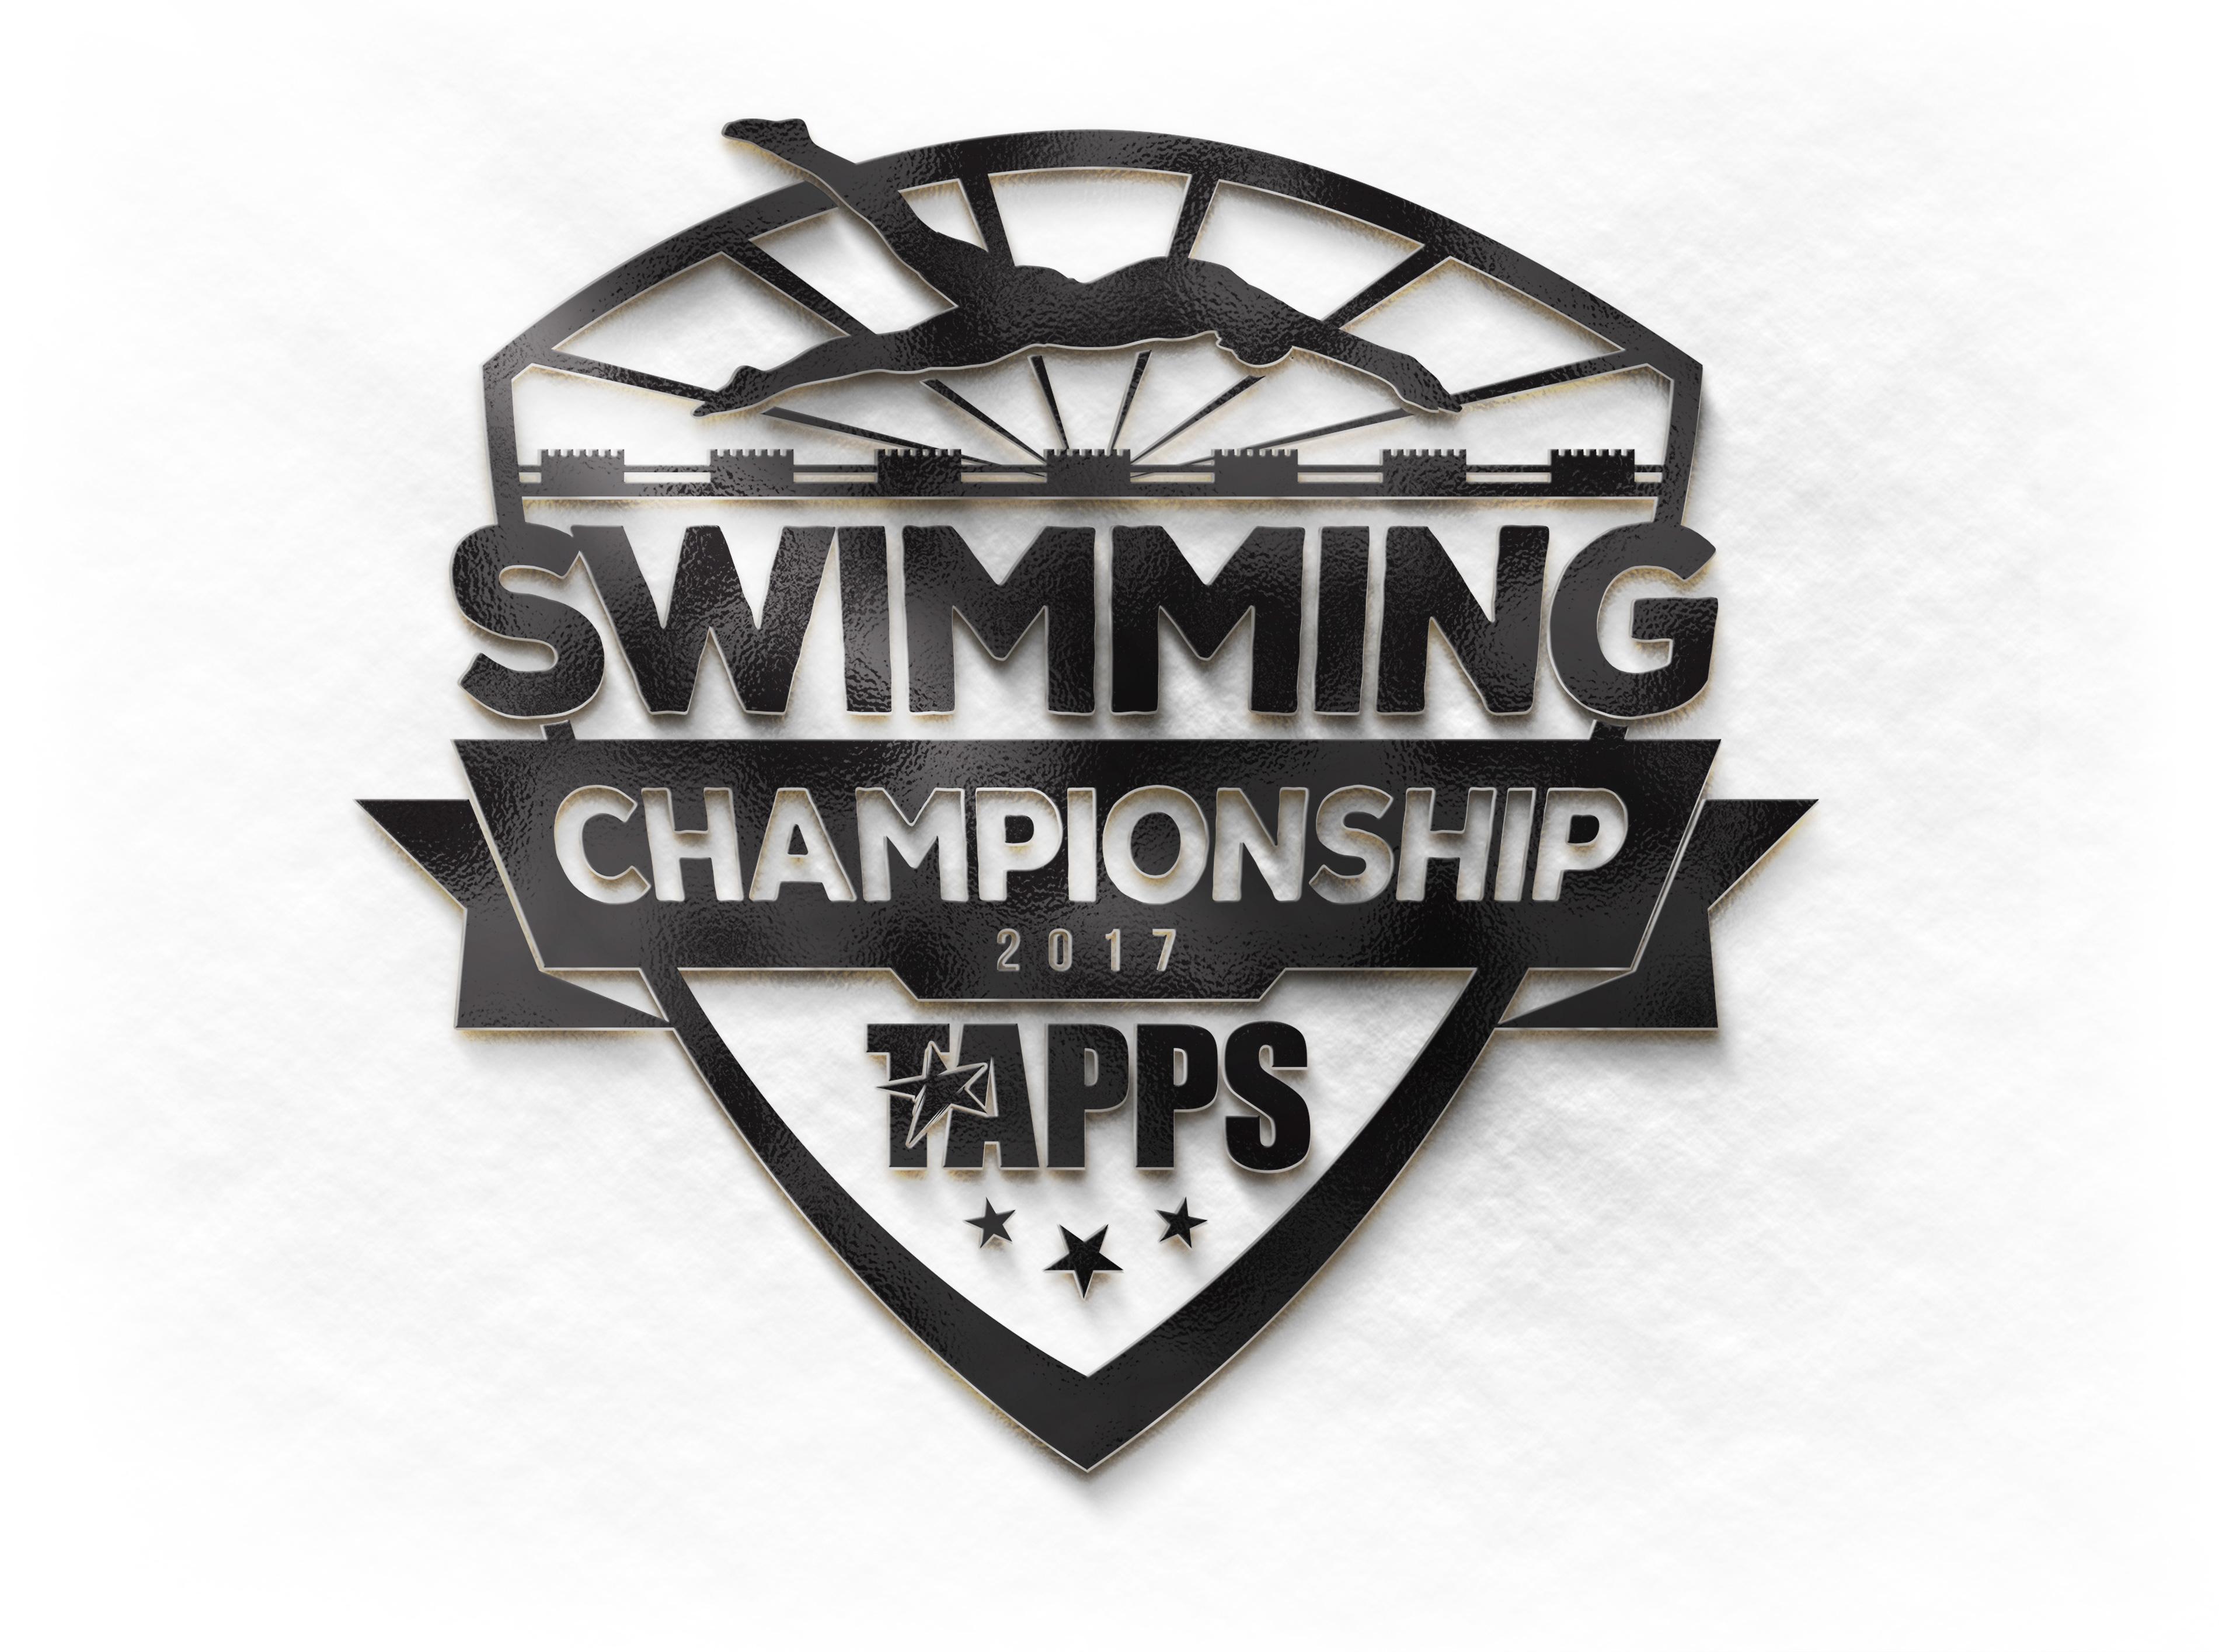 2017 Swim Championships